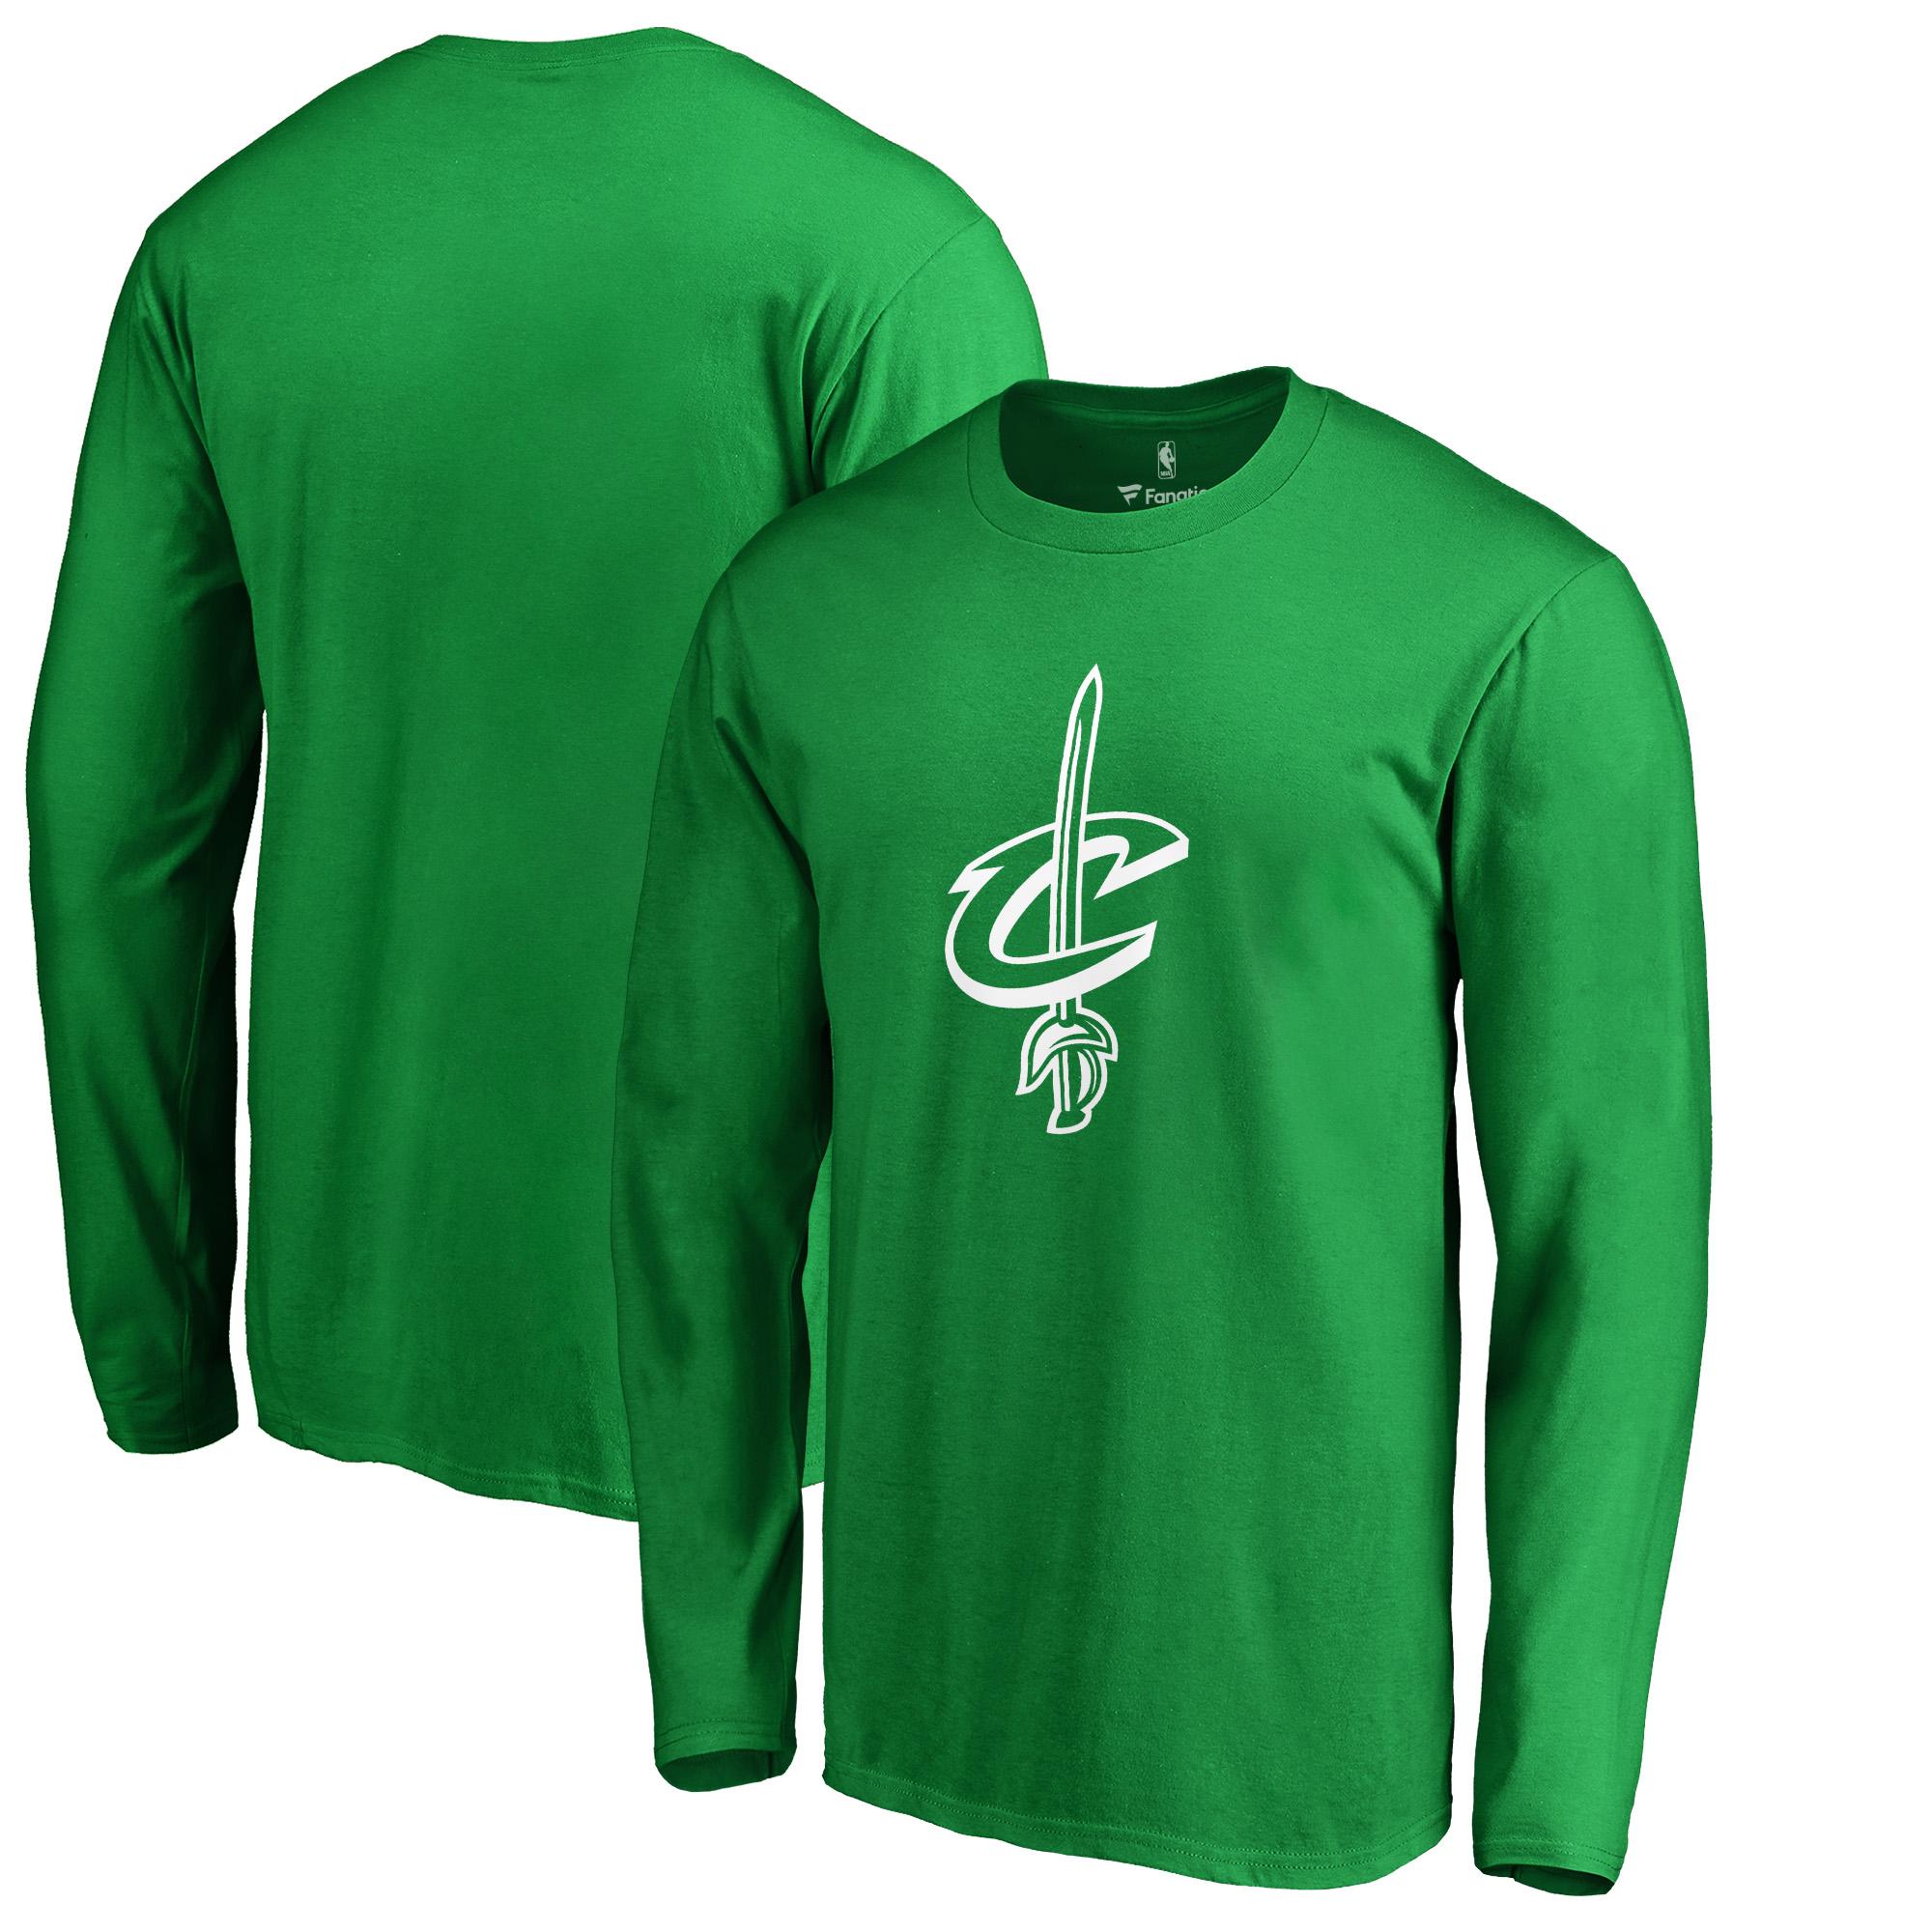 Cleveland Cavaliers Fanatics Branded St. Patrick's Day White Logo Long Sleeve T-Shirt - Kelly Green